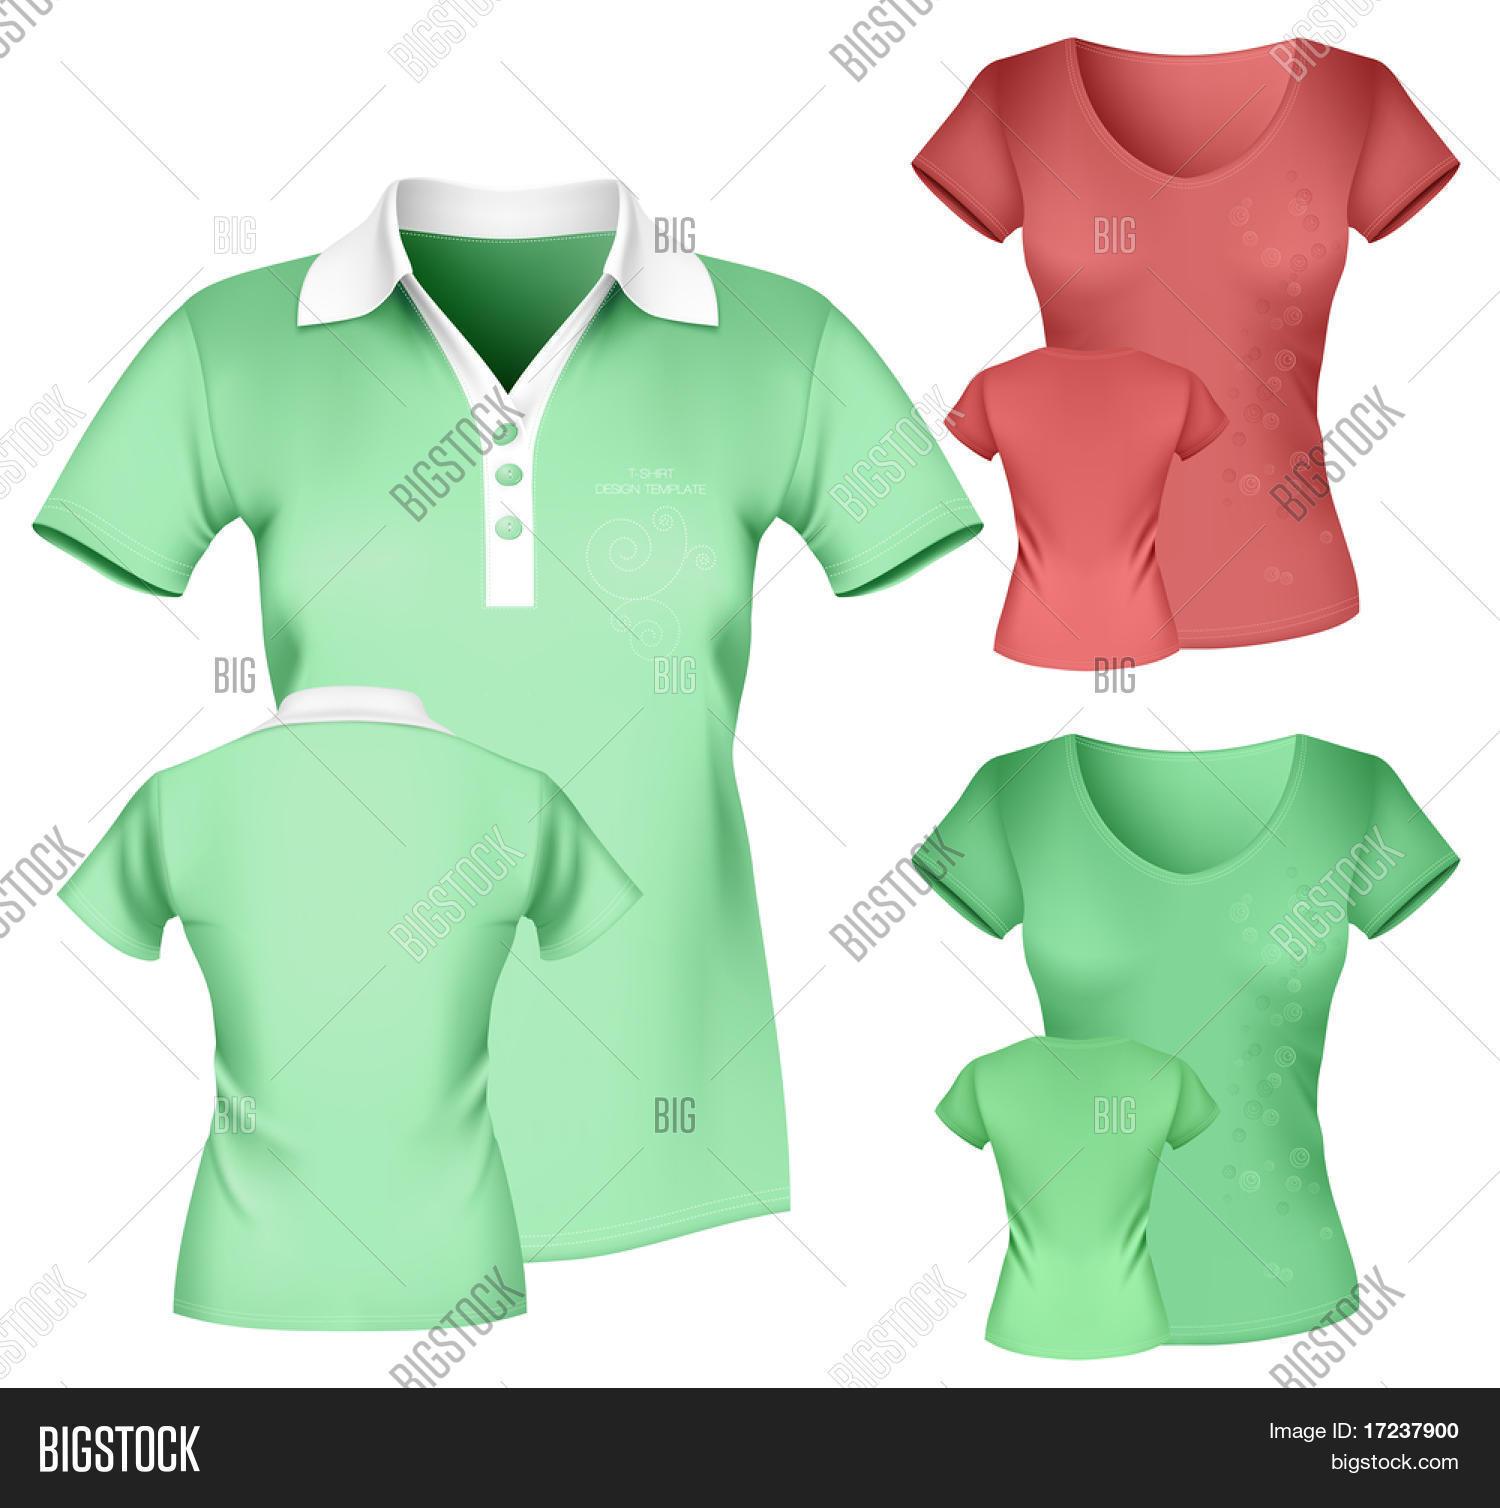 Polo shirt design vector - Photo Realistic Vector Illustration Women S Polo Shirt And T Shirt Design Template